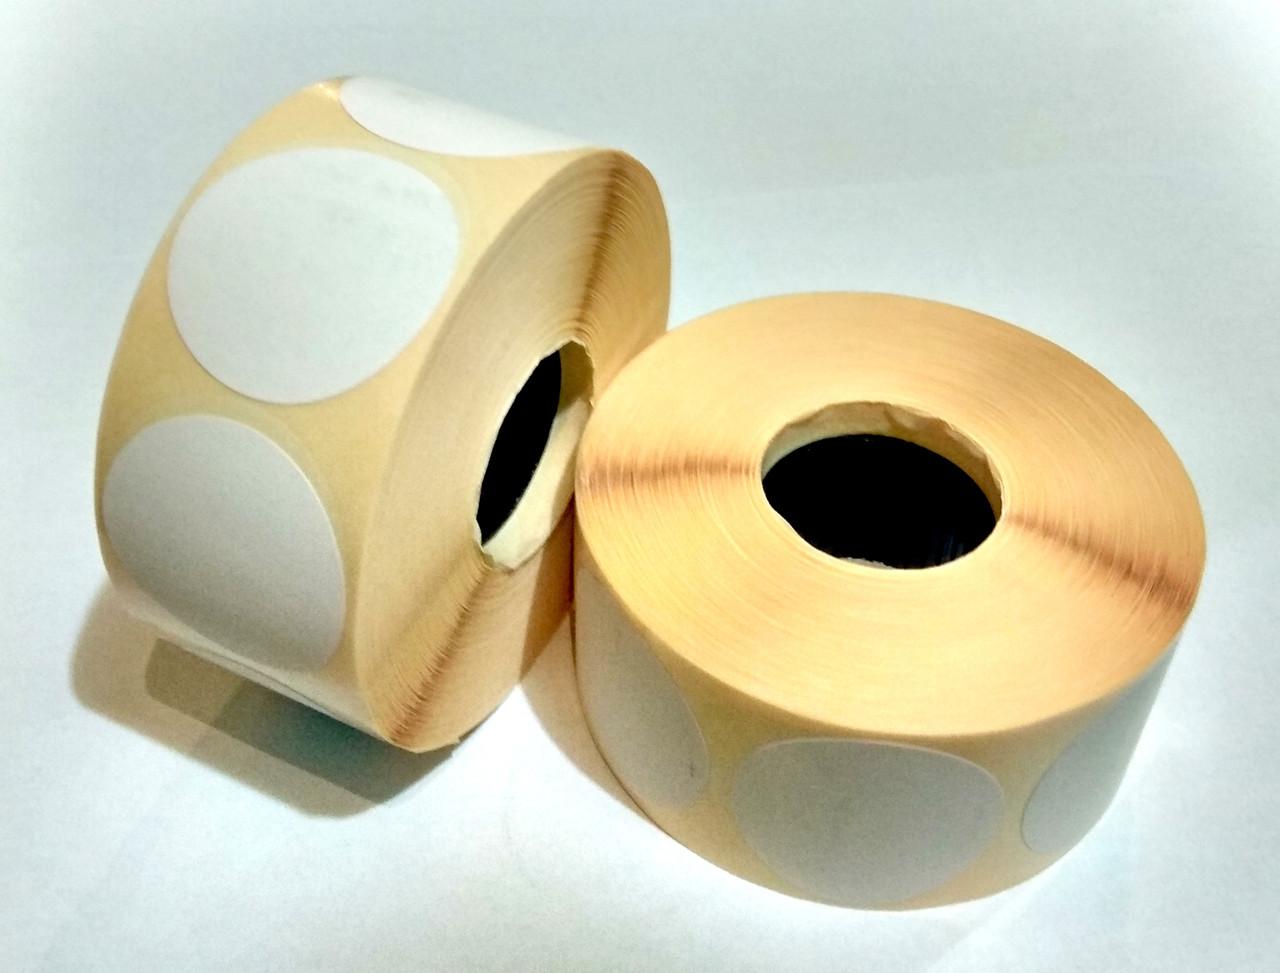 Термоэтикетка Т.Еко круг 50 мм 1000 этикеток круглая 10 шт White (Ф50T1000)